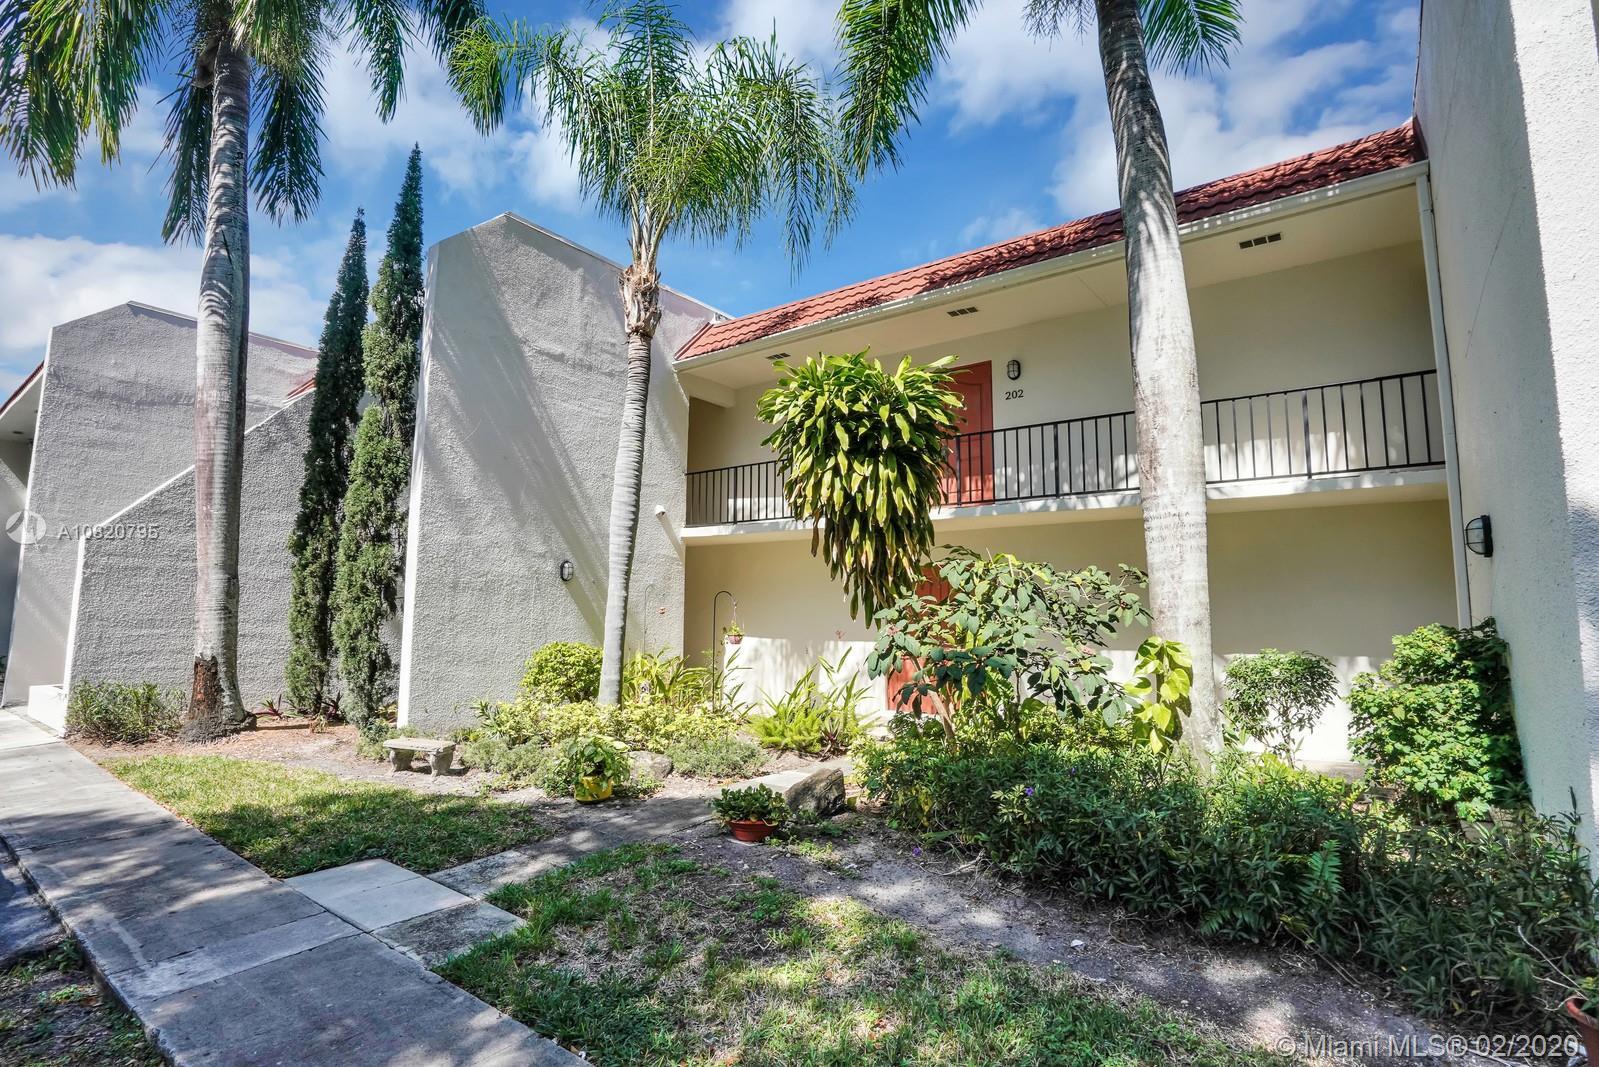 1639 Embassy Dr 202, West Palm Beach, FL 33401